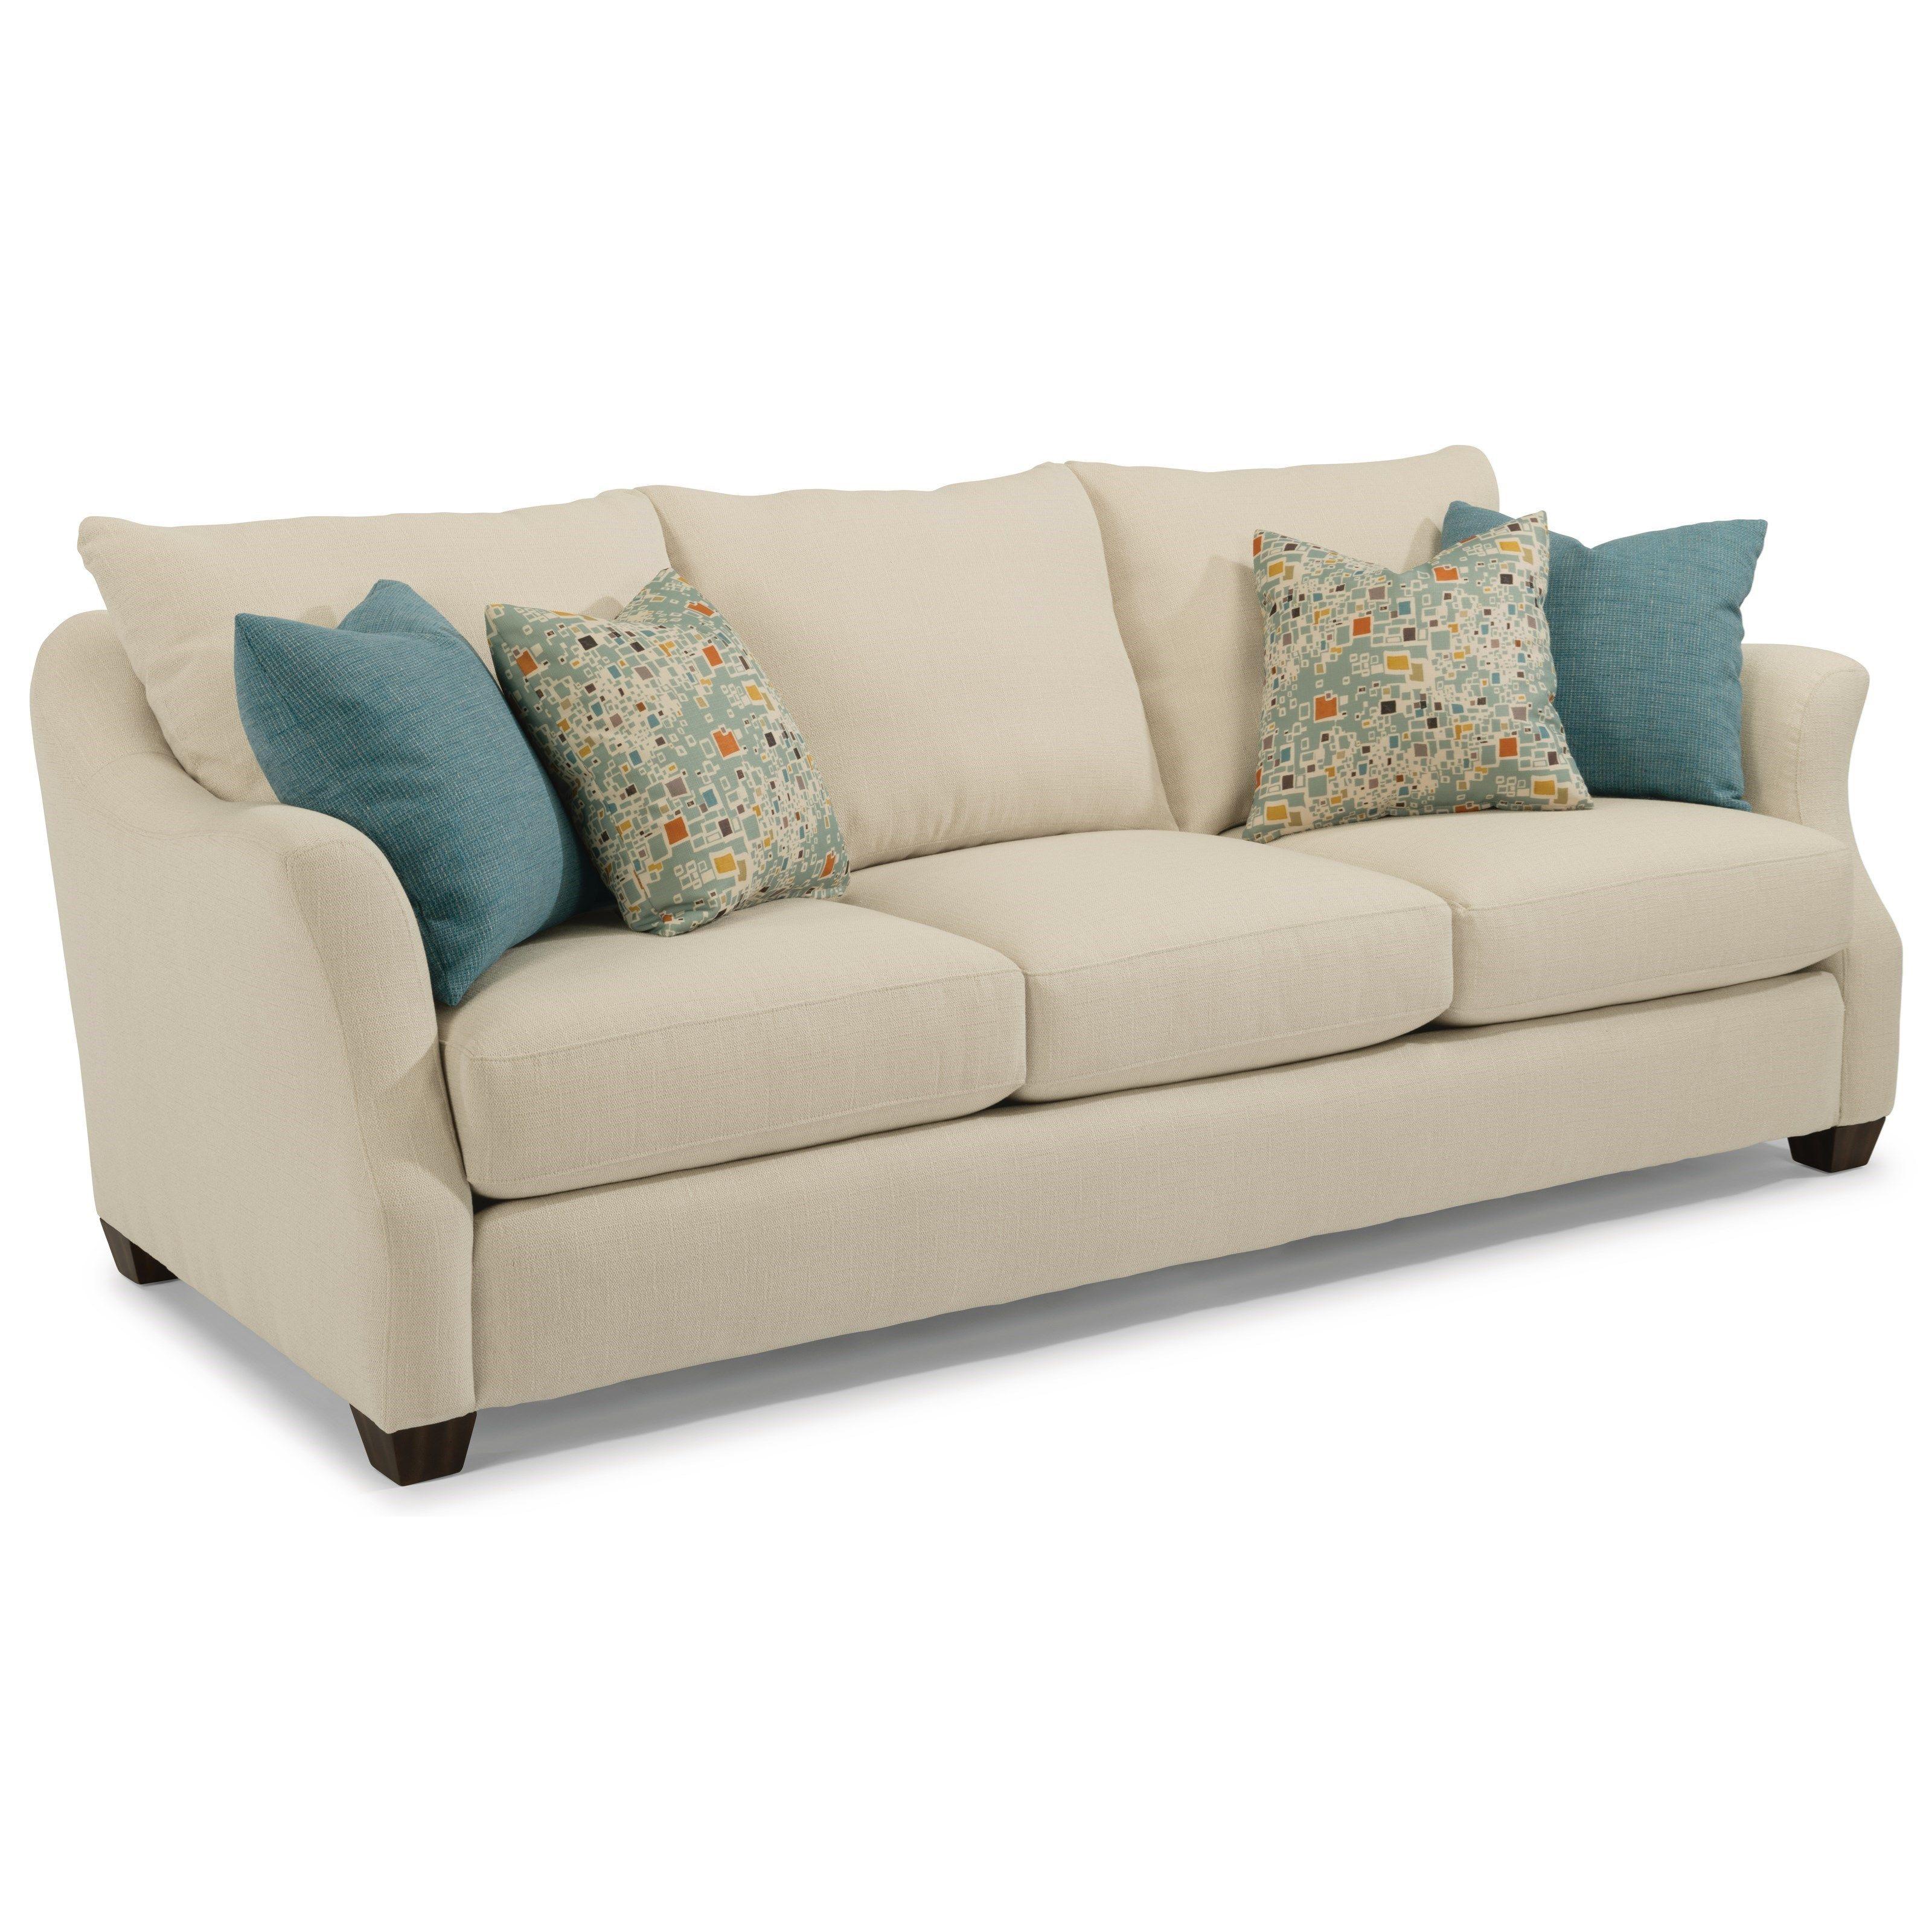 Hope Sofa by Flexsteel | New House | Pinterest | Transitional sofas ...